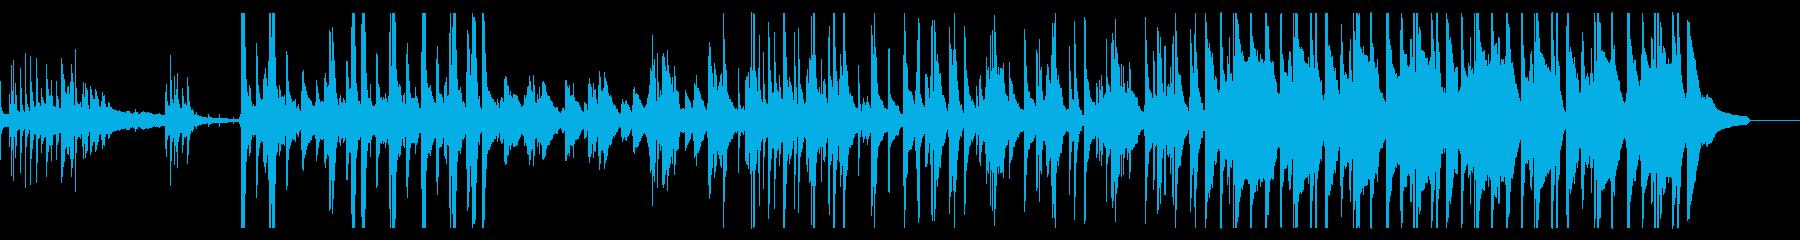 Lofi/Jazzhopの再生済みの波形